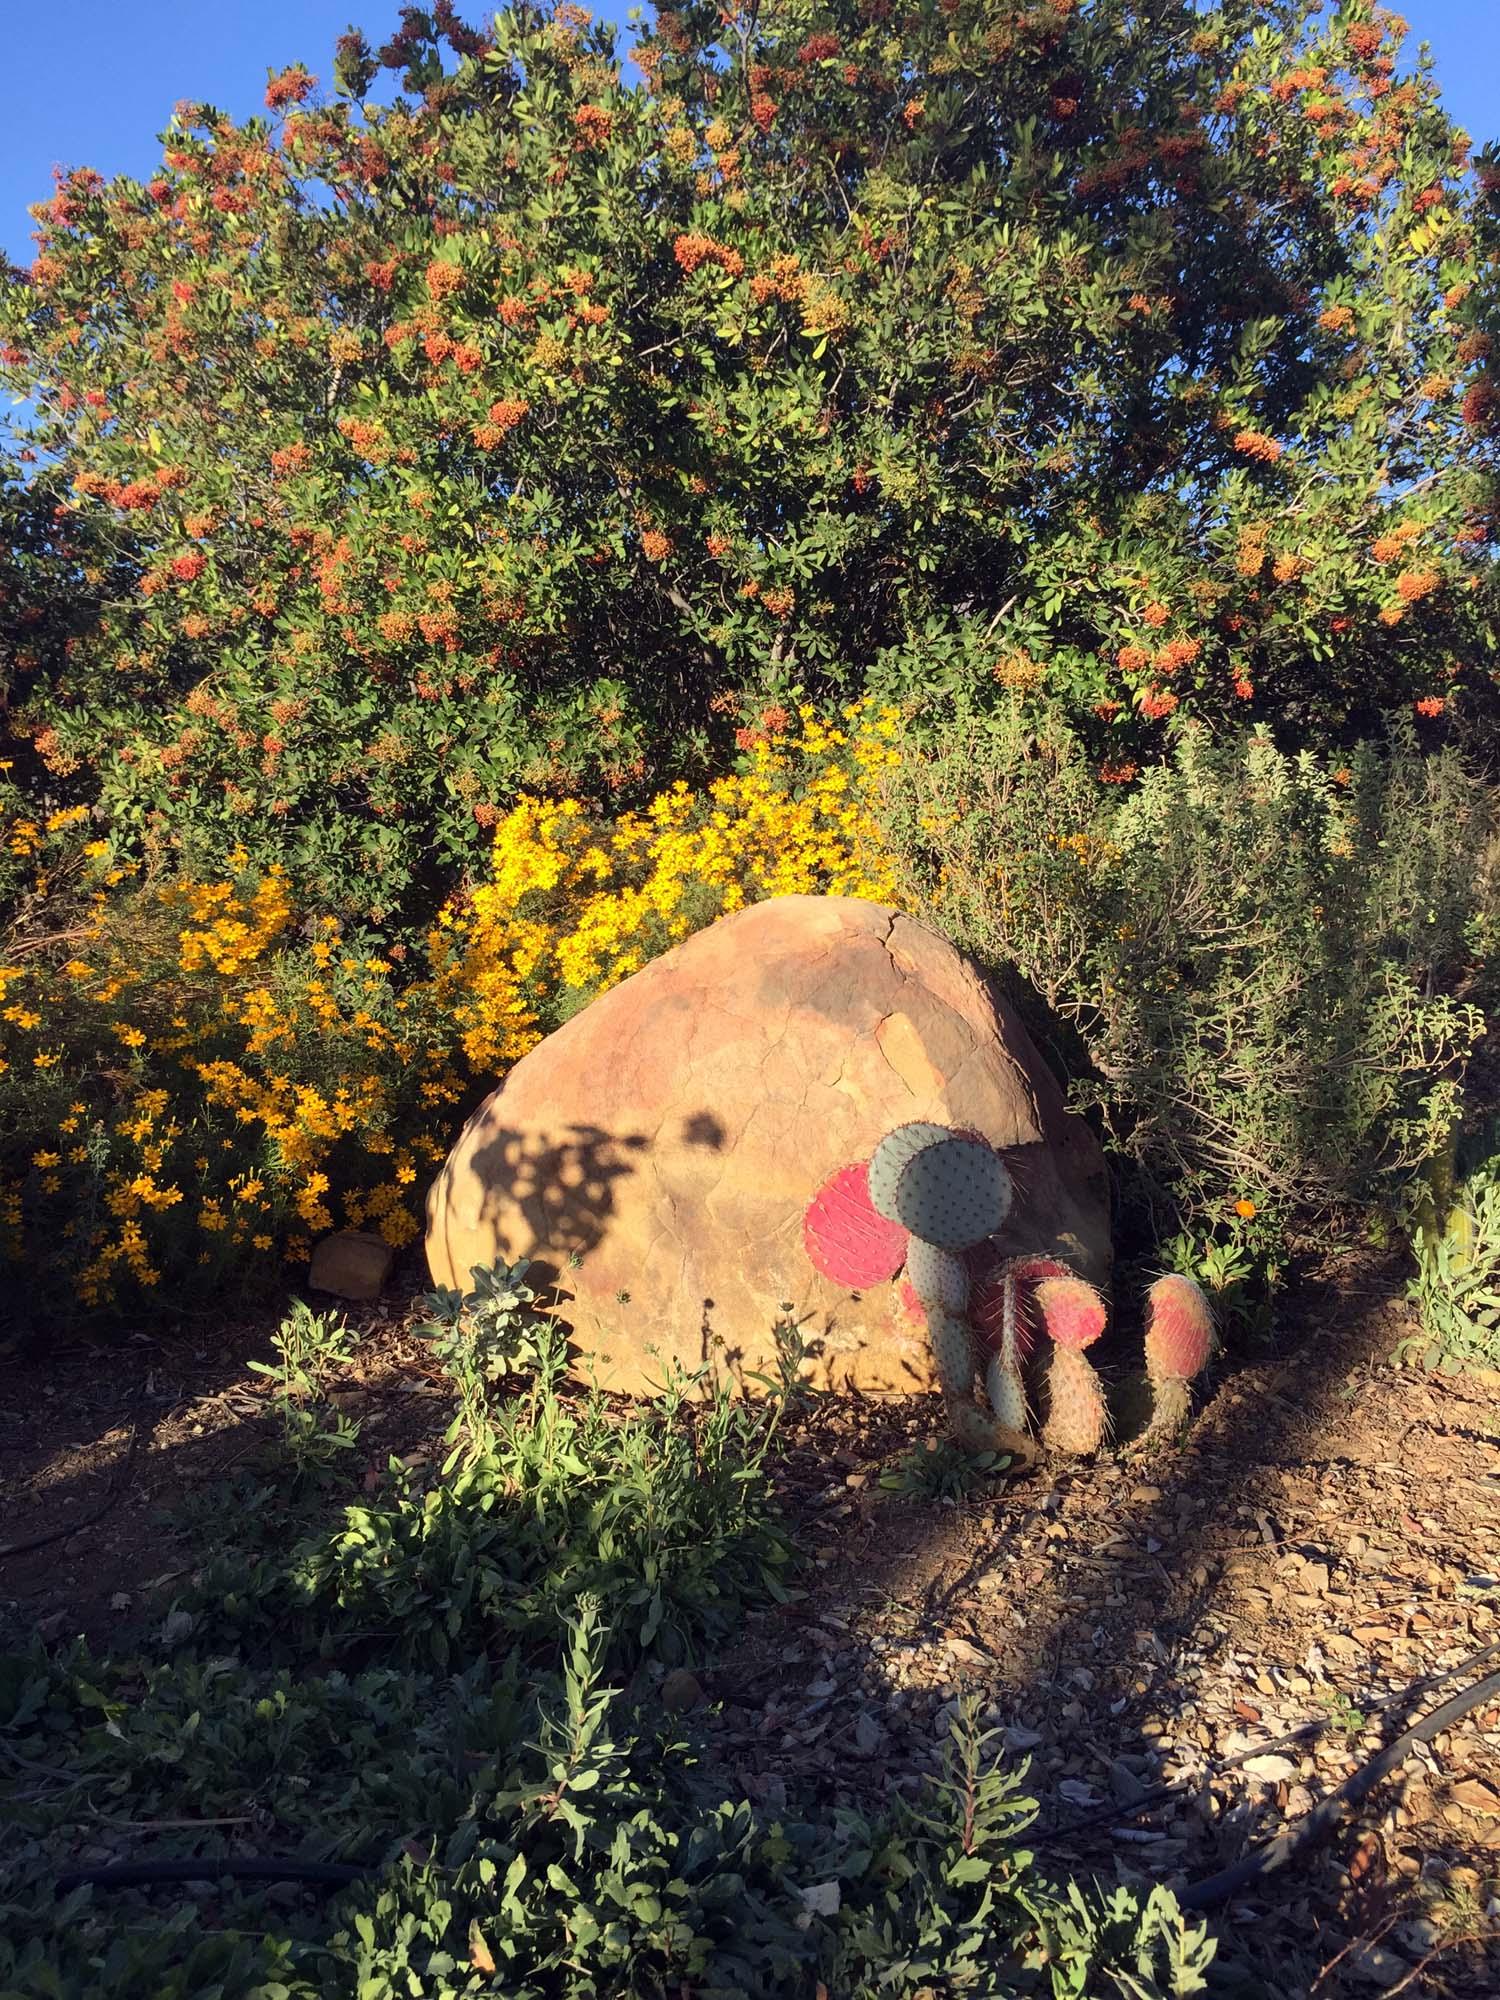 Cactus_rock2.jpg